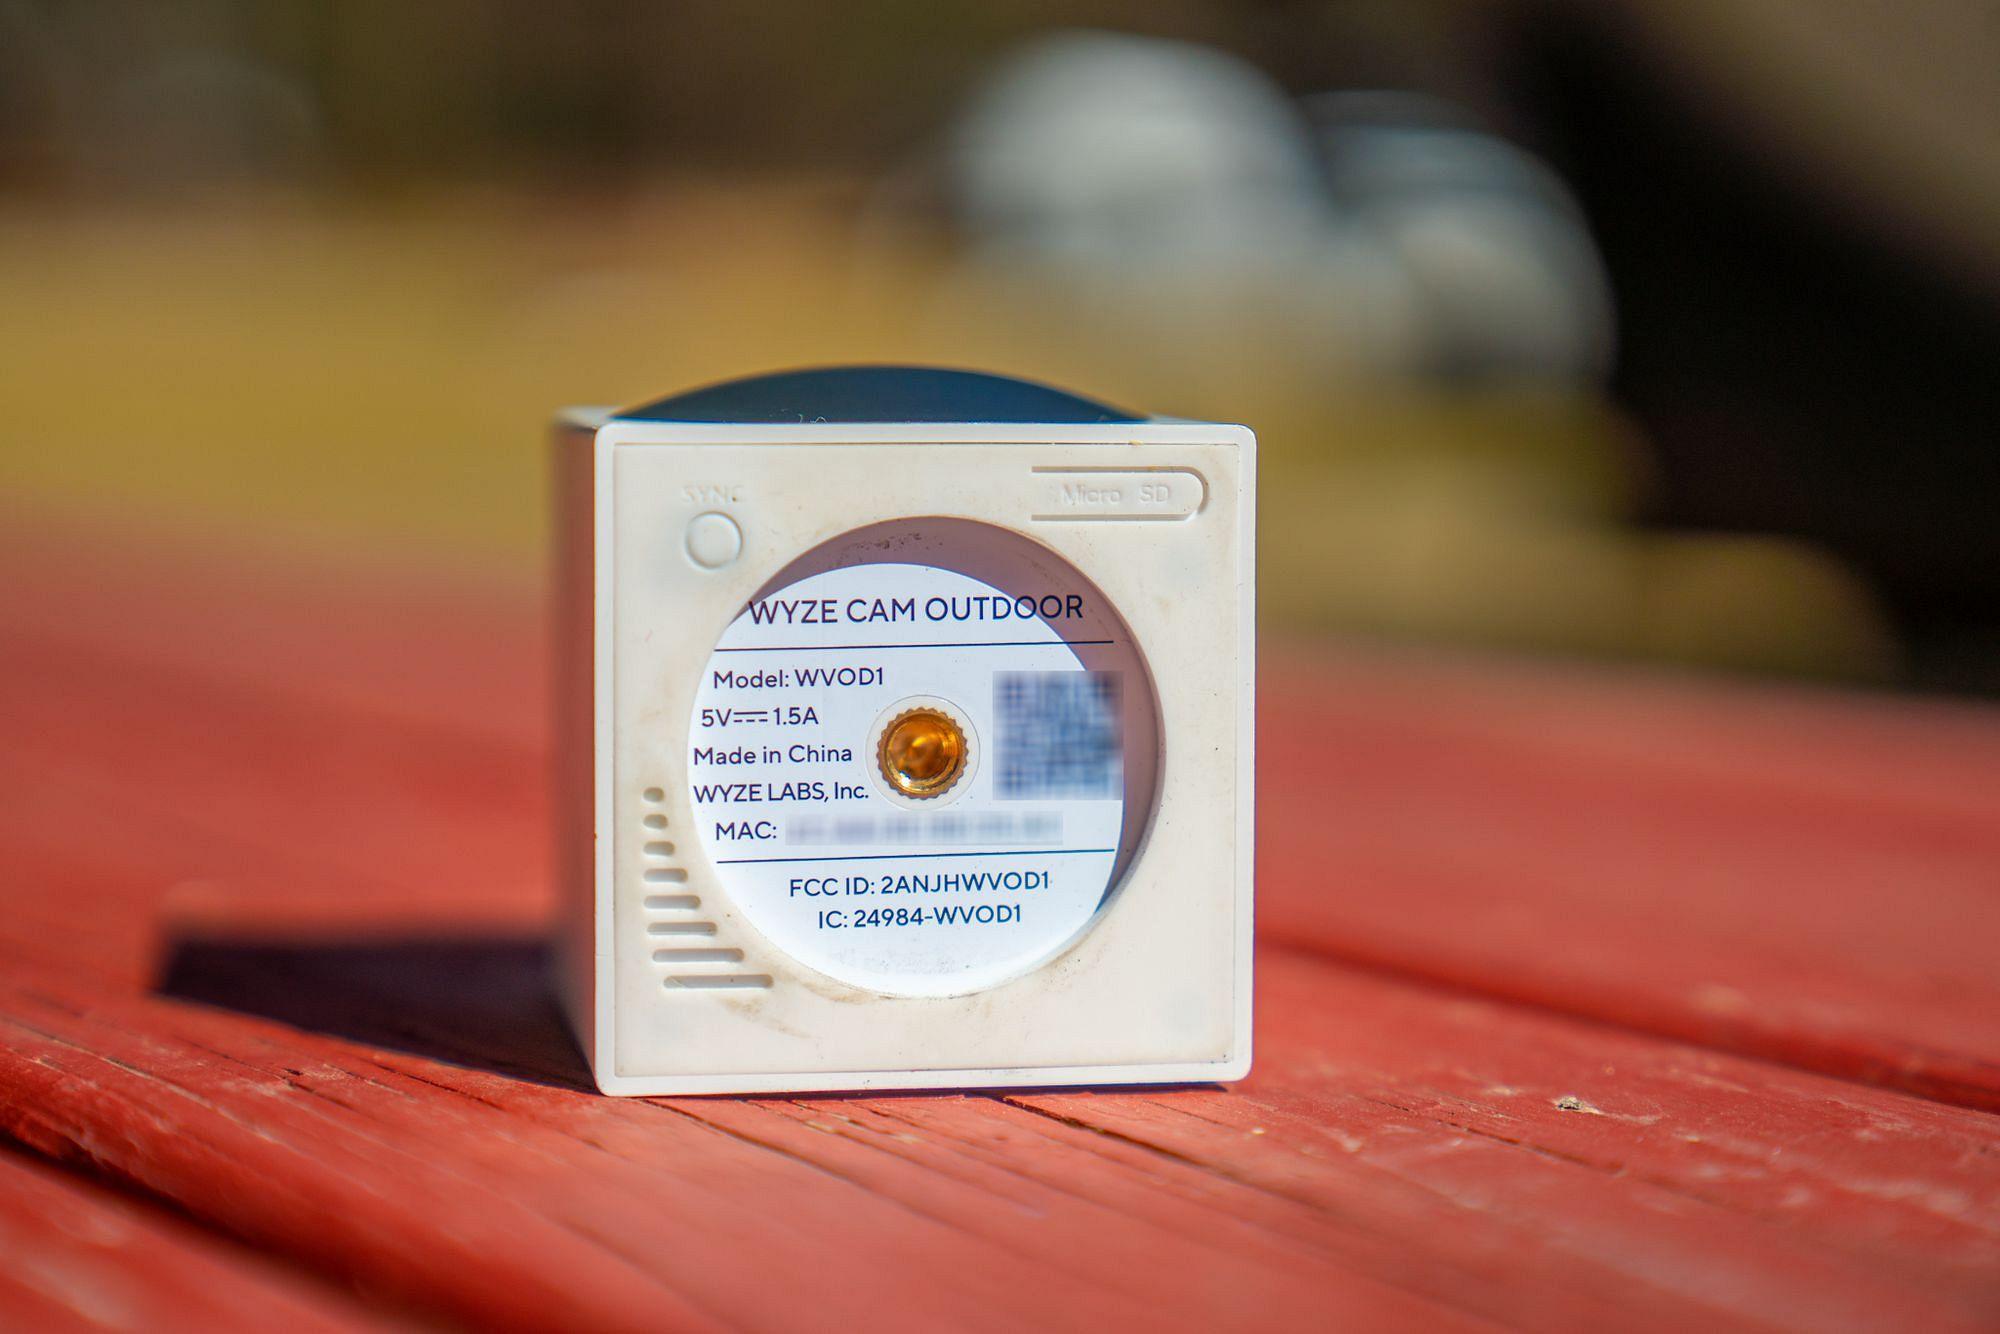 Wyze Cam Outdoor Magnetic Mount